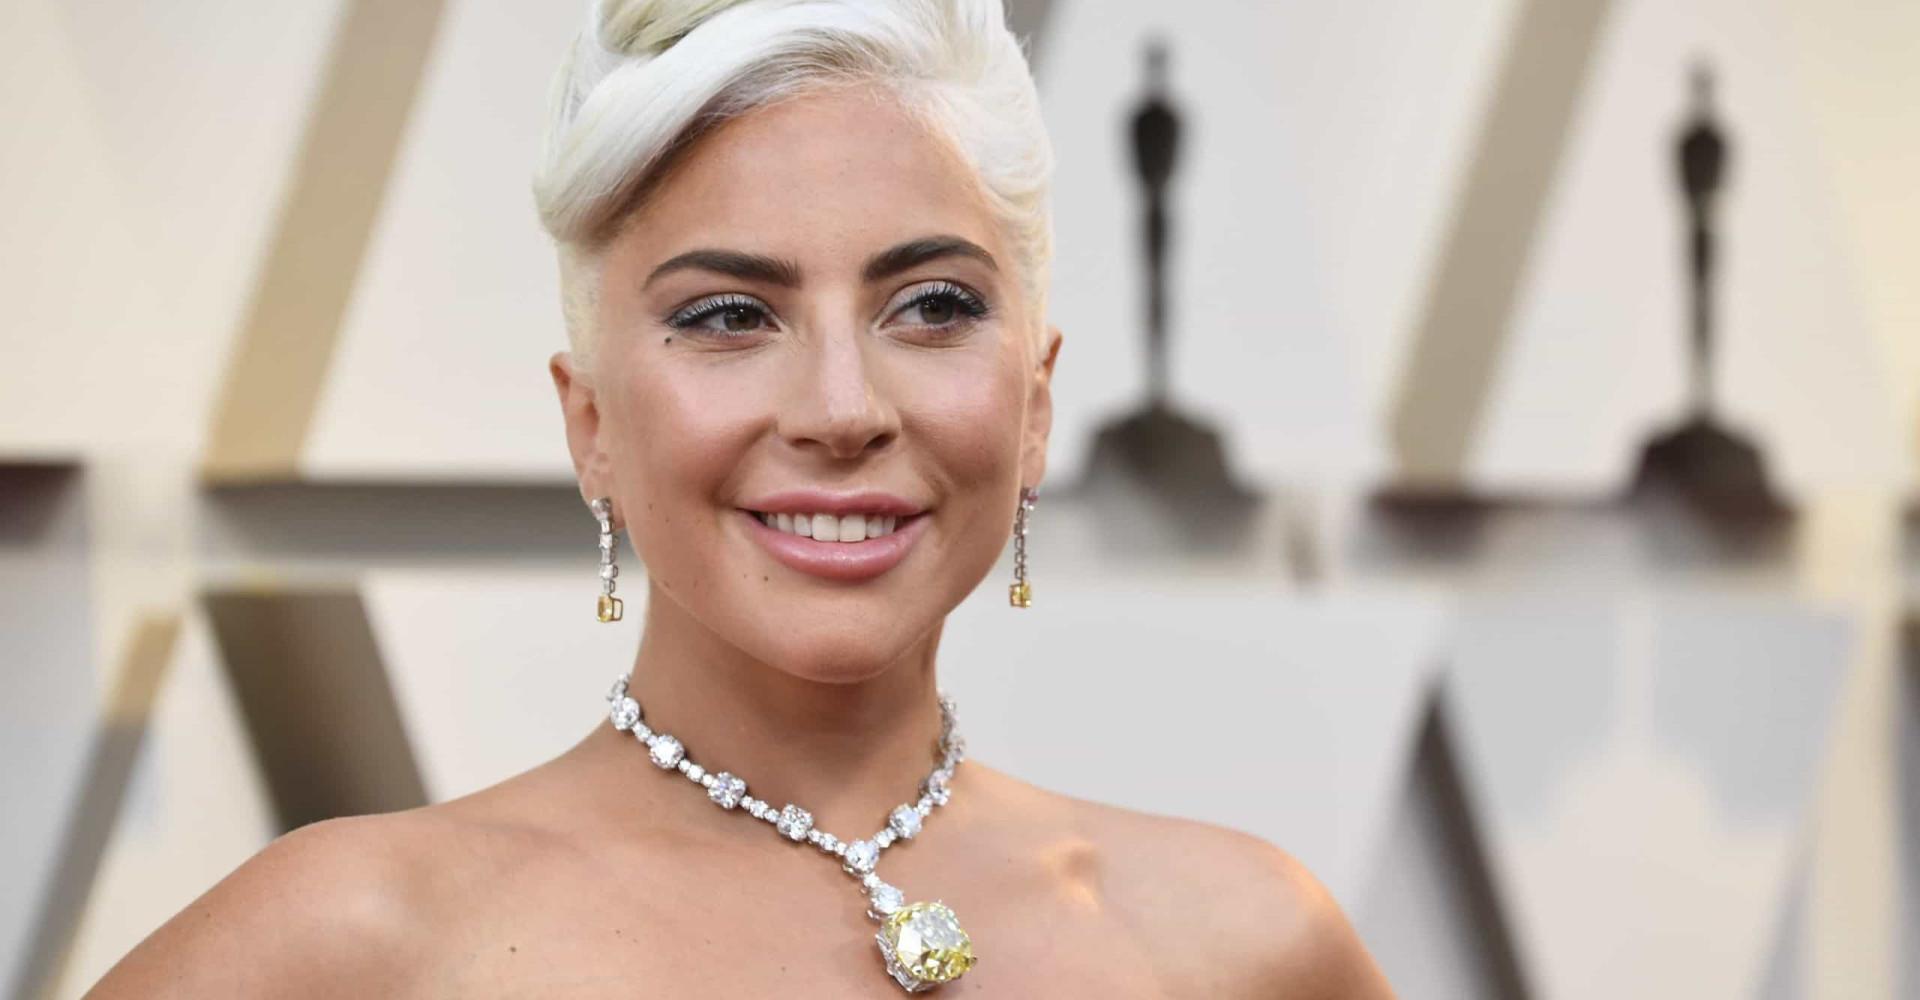 Así se convirtió Stefani Joanne en Lady Gaga